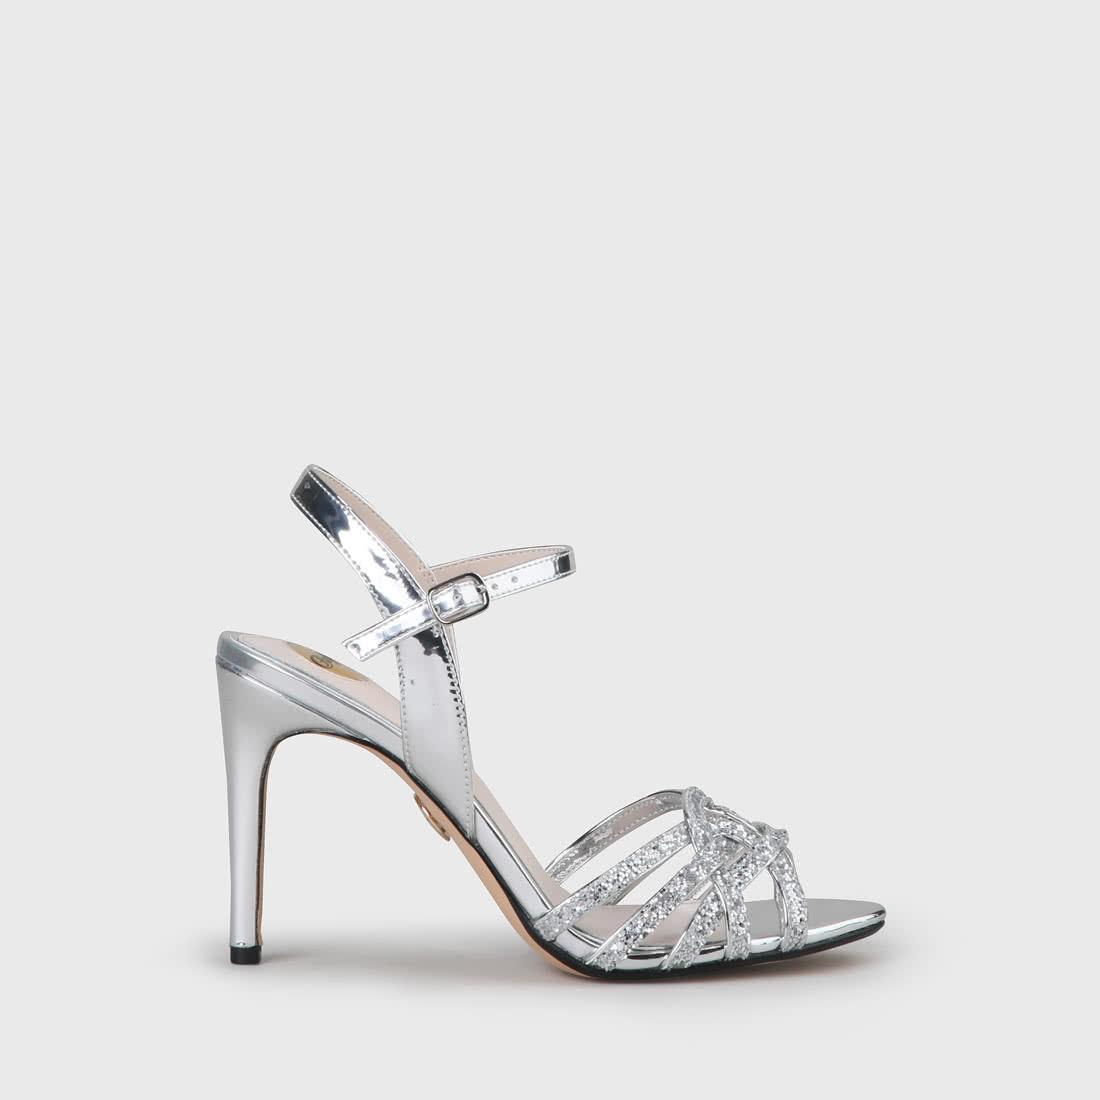 JANNA High Heel Sandalette silver